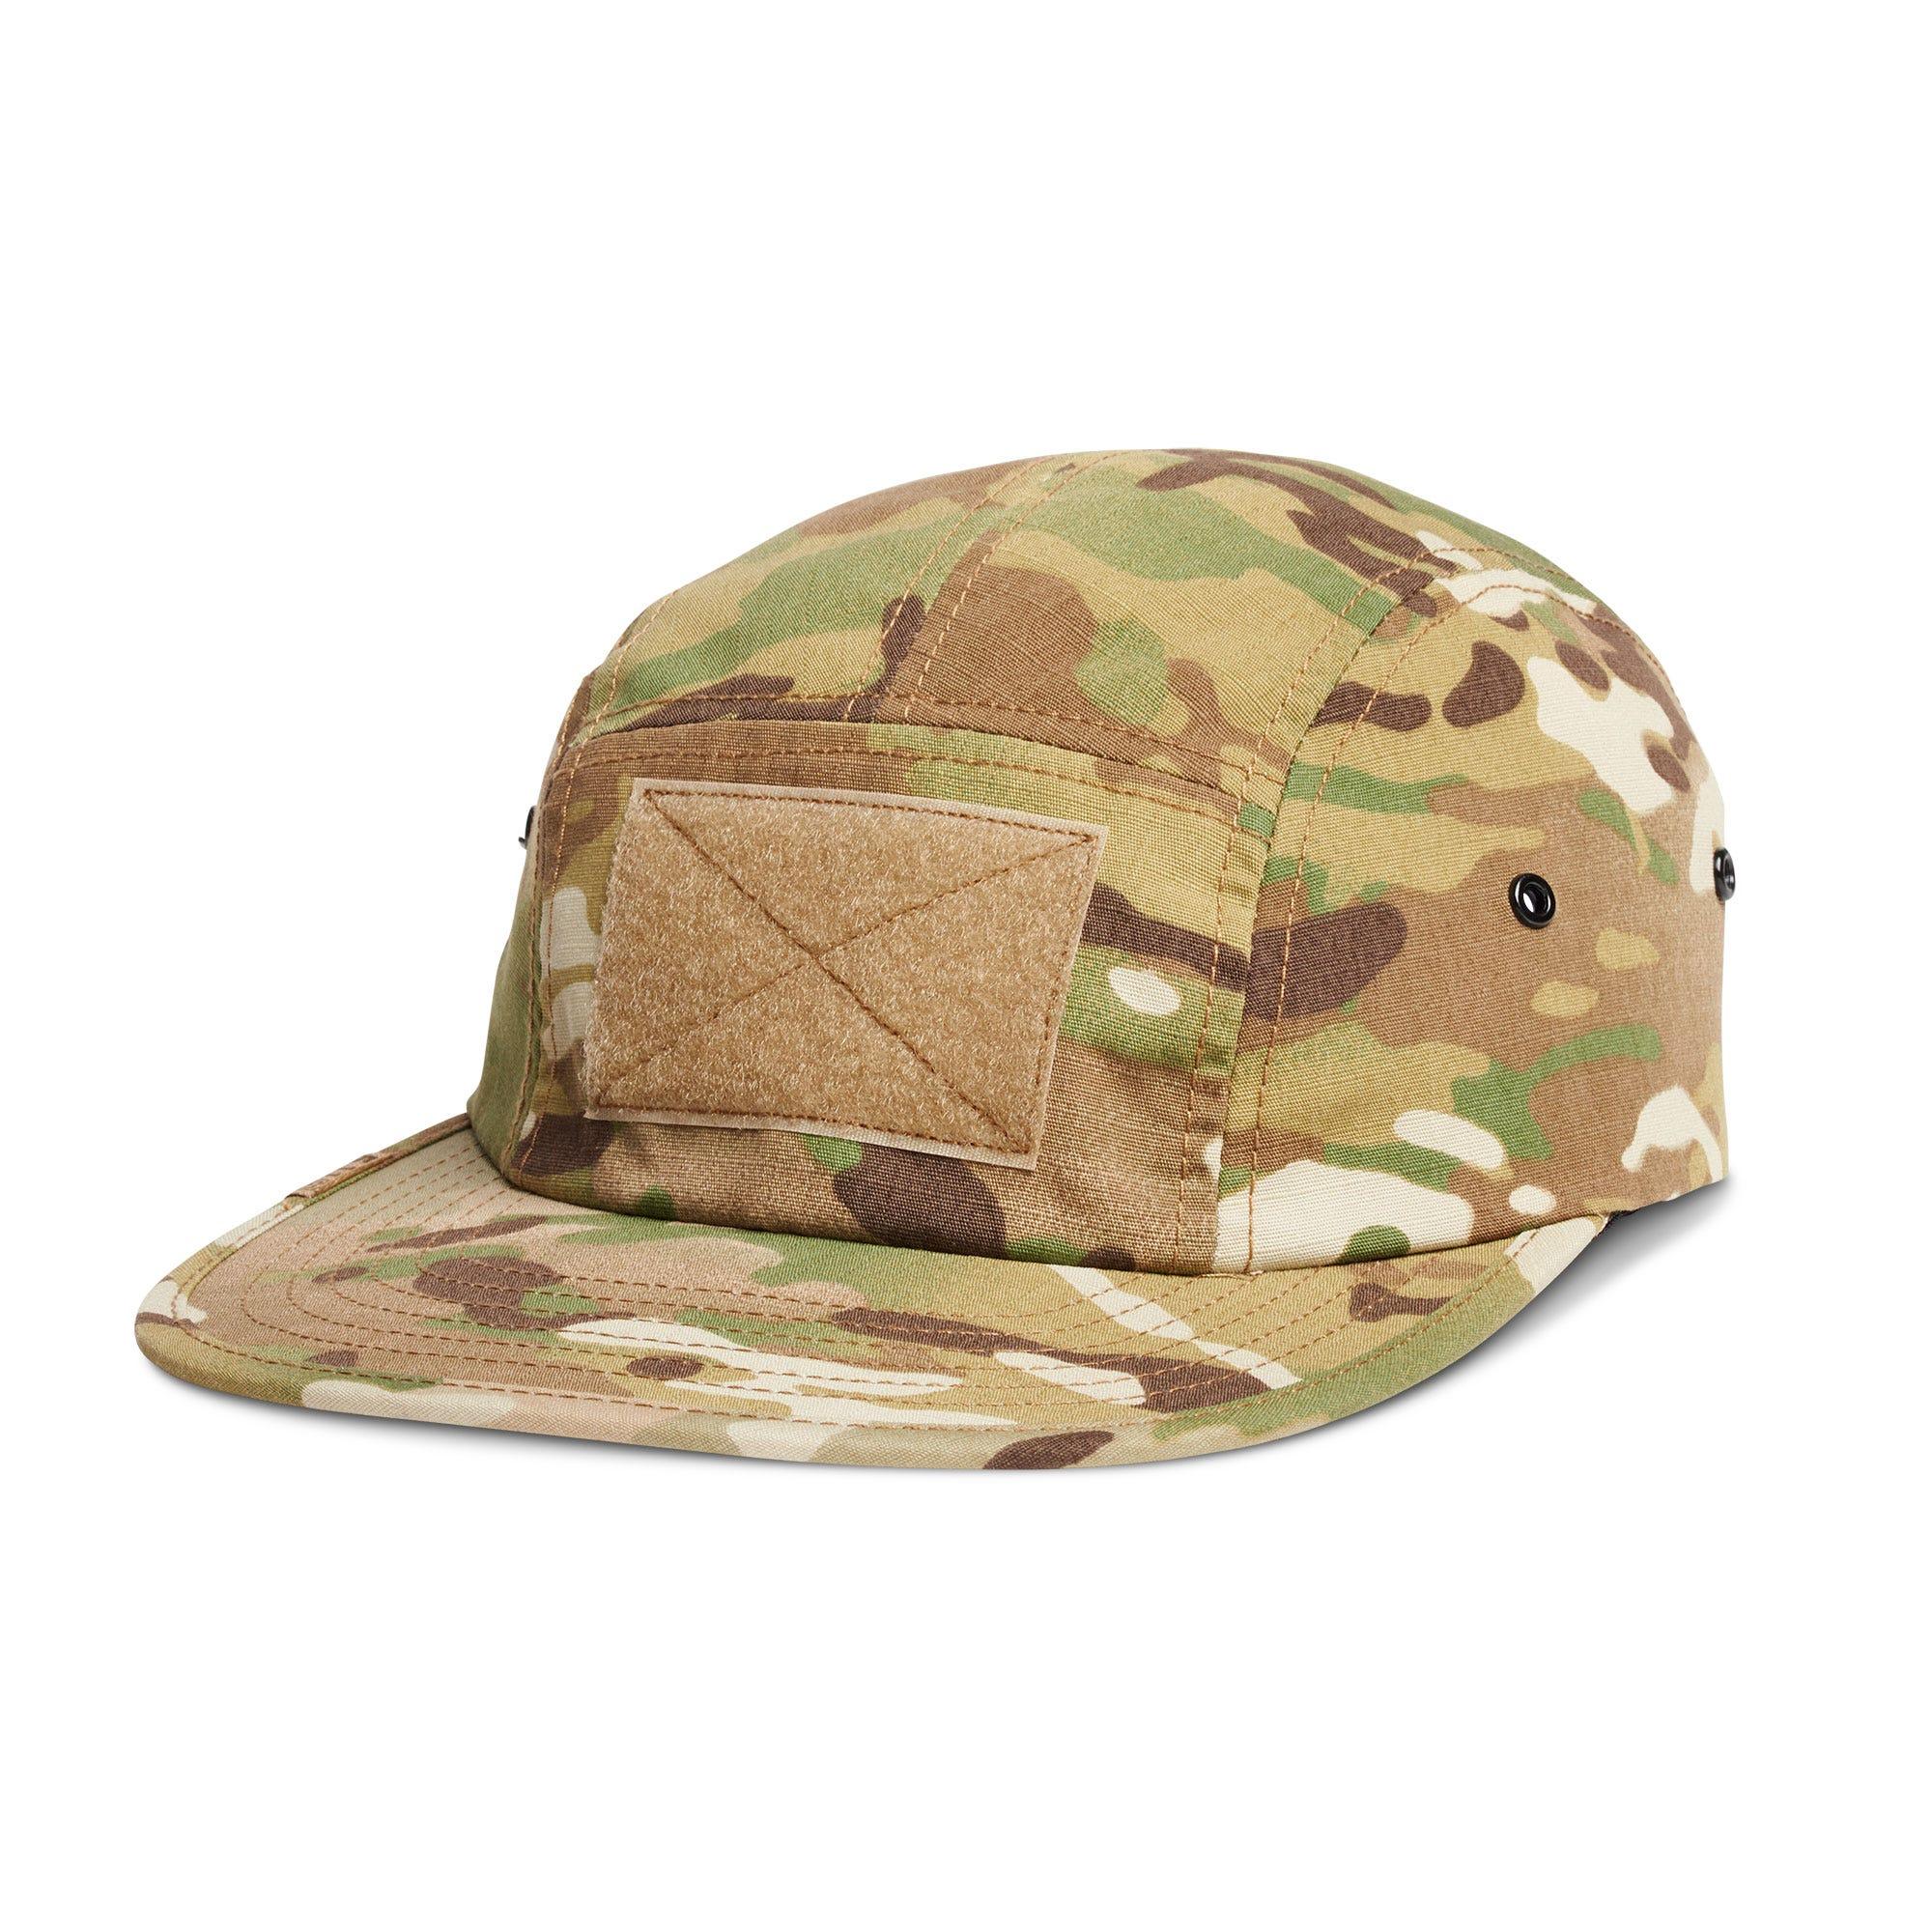 5.11 Tactical Men's America's Cap (Camo;Multi) thumbnail